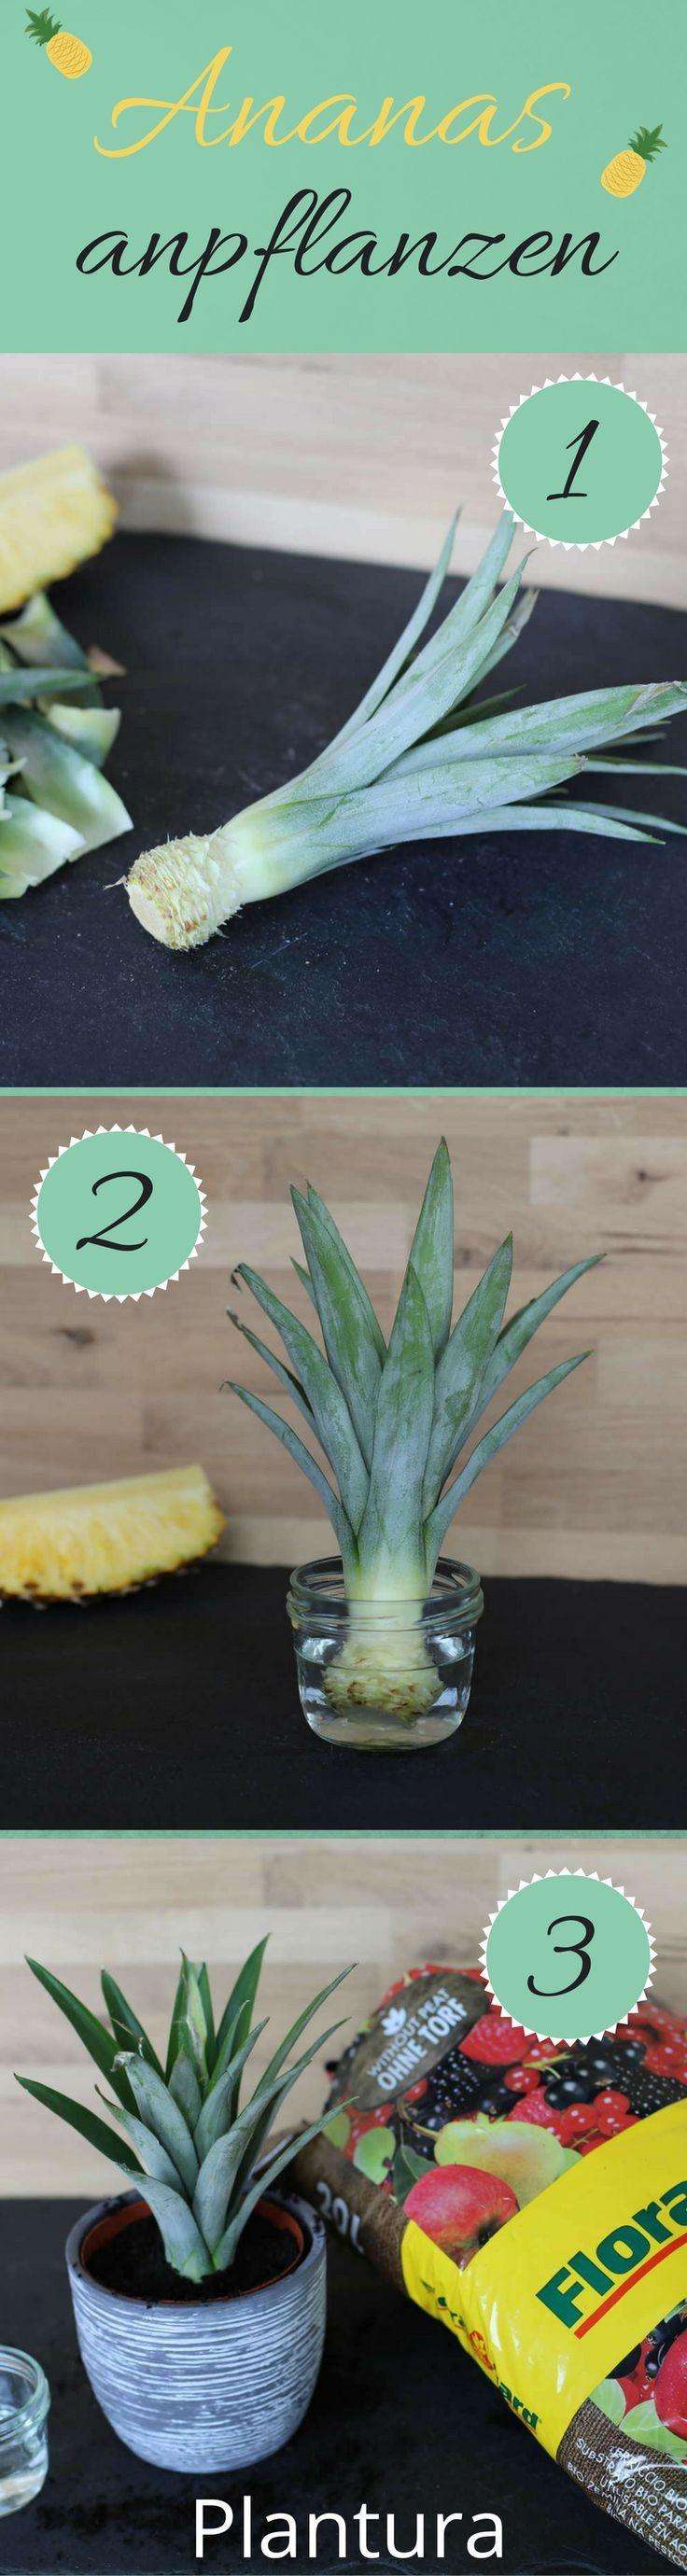 ananas anpflanzen vermehrung anbau anleitung me like pinterest garten ananas und. Black Bedroom Furniture Sets. Home Design Ideas